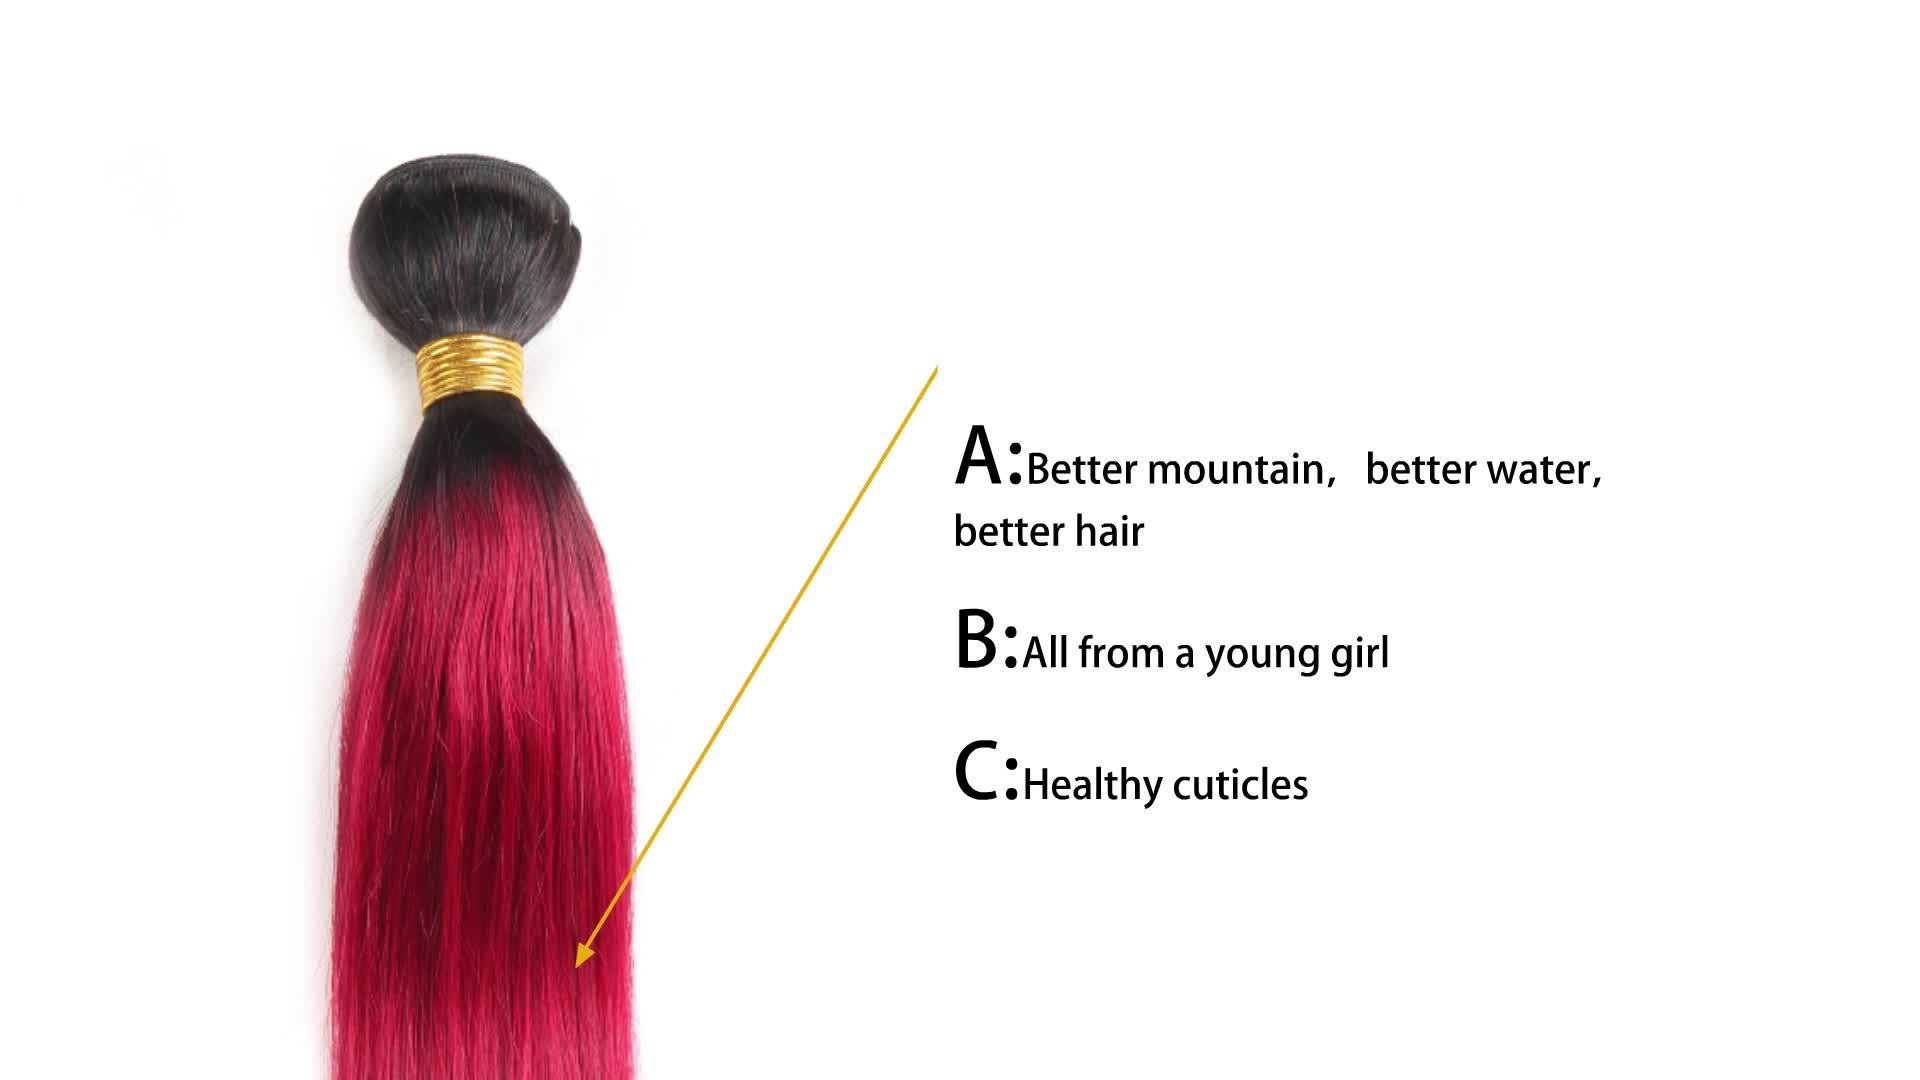 Hot Koop Snelle Verzending Ombre Kleur 1B/Burg # Raw Indian Remy Human Hair Extensions